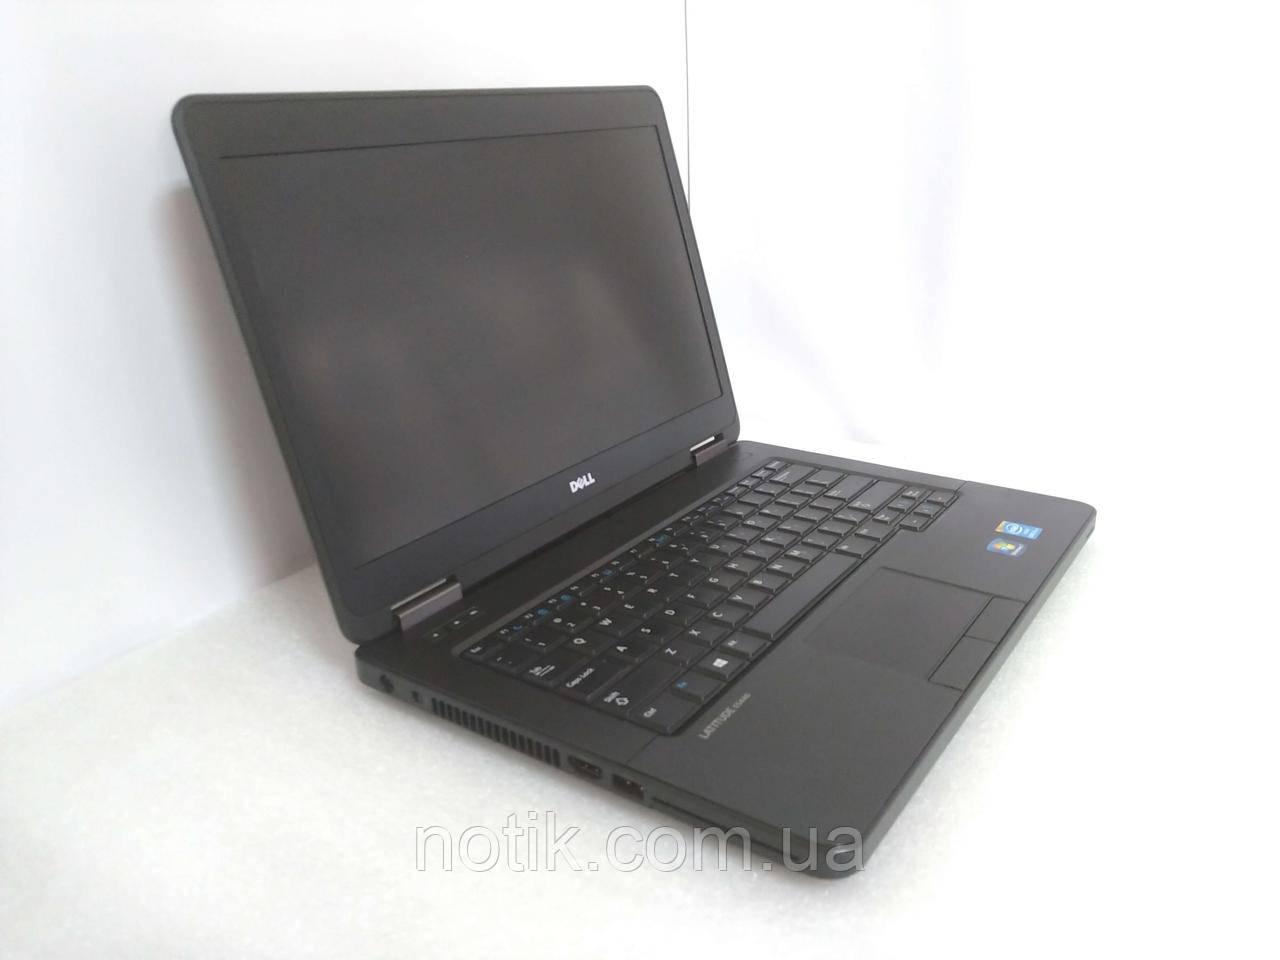 "Ноутбук Dell E5440 i5-4300U/ 4Gb/ 320Gb/ GeForce GT720 2Gb/ DVDRW/ Win10/ 14"""